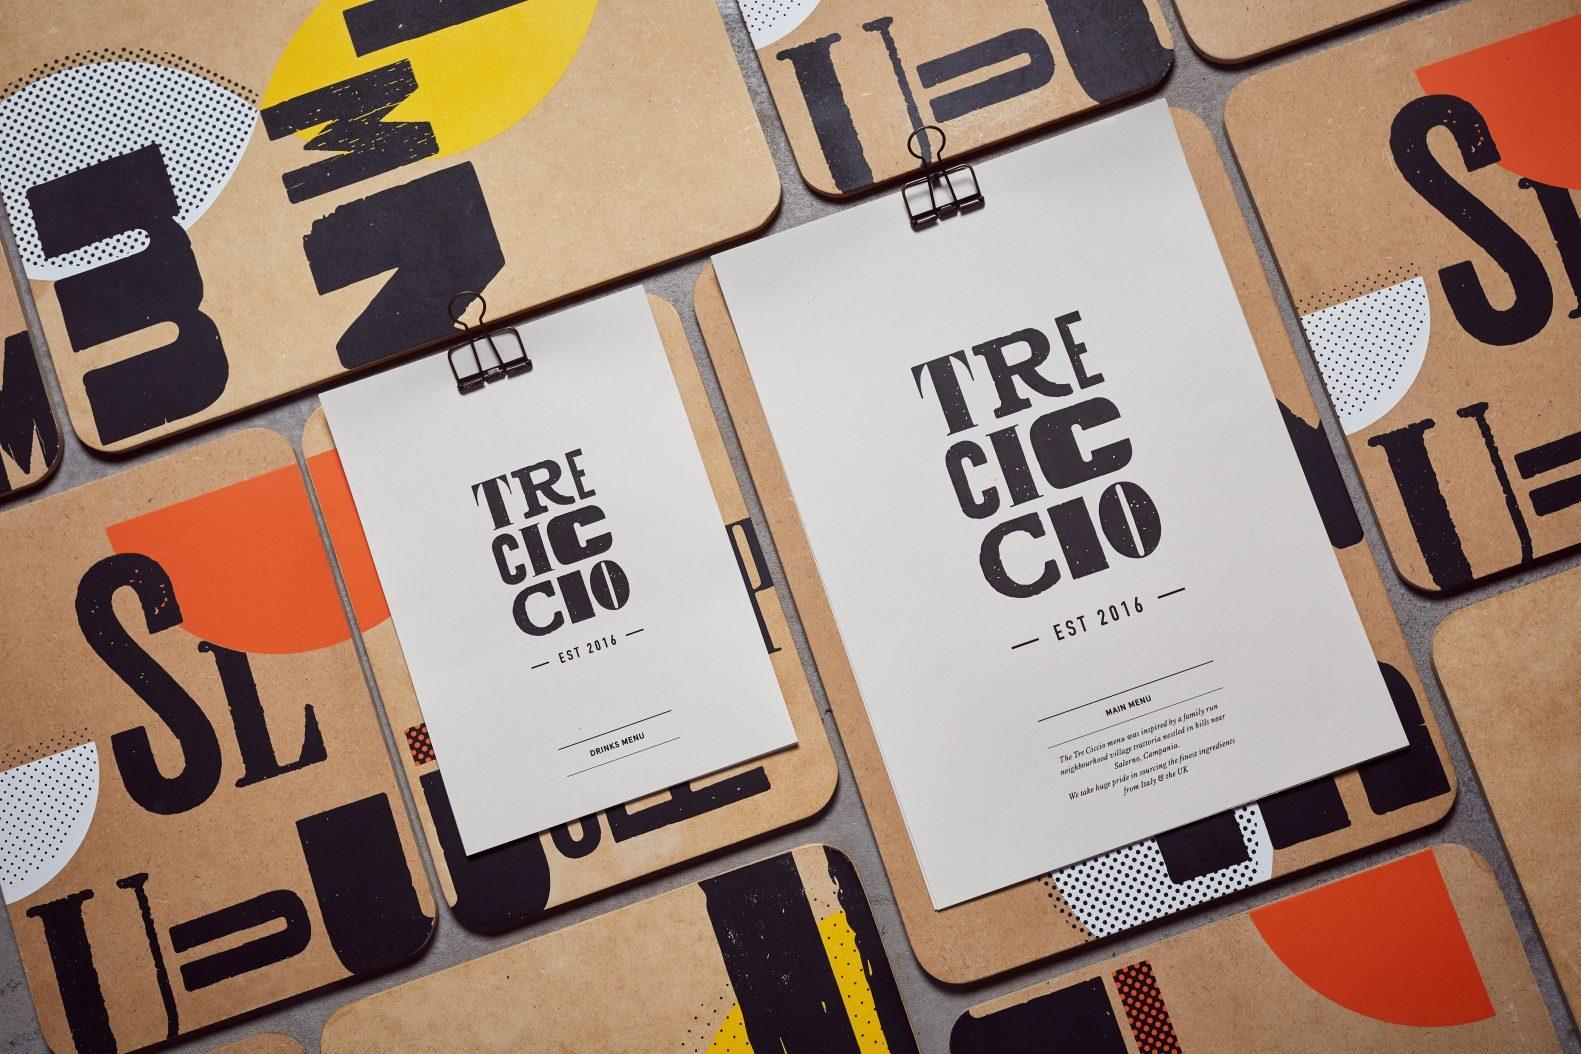 Tre Ciccio Brand Identity Creation by Phaus Designers